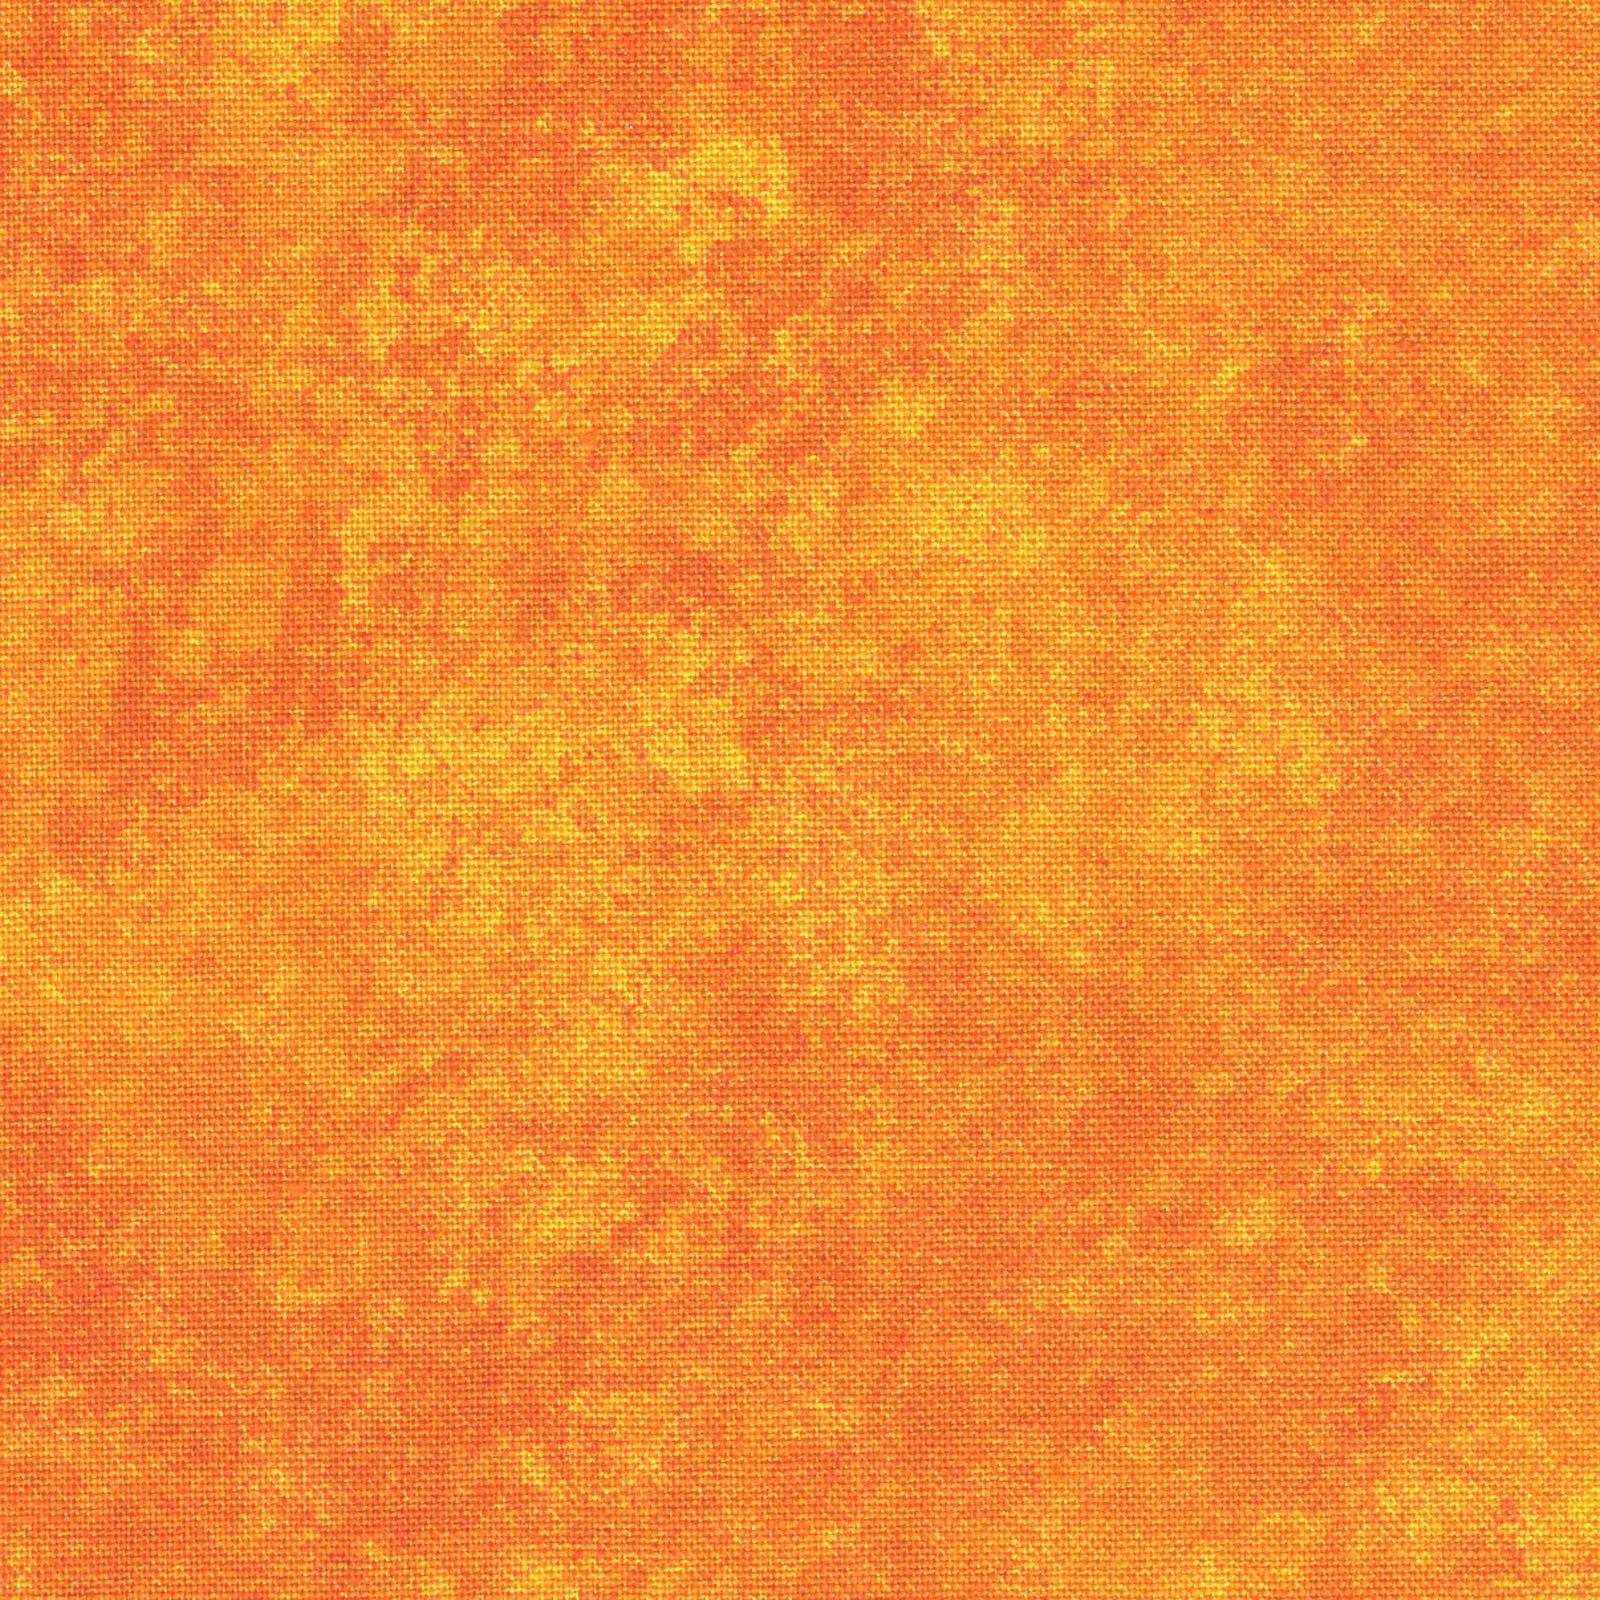 Shadowplay Orange<br/>Maywood Studio 513-O